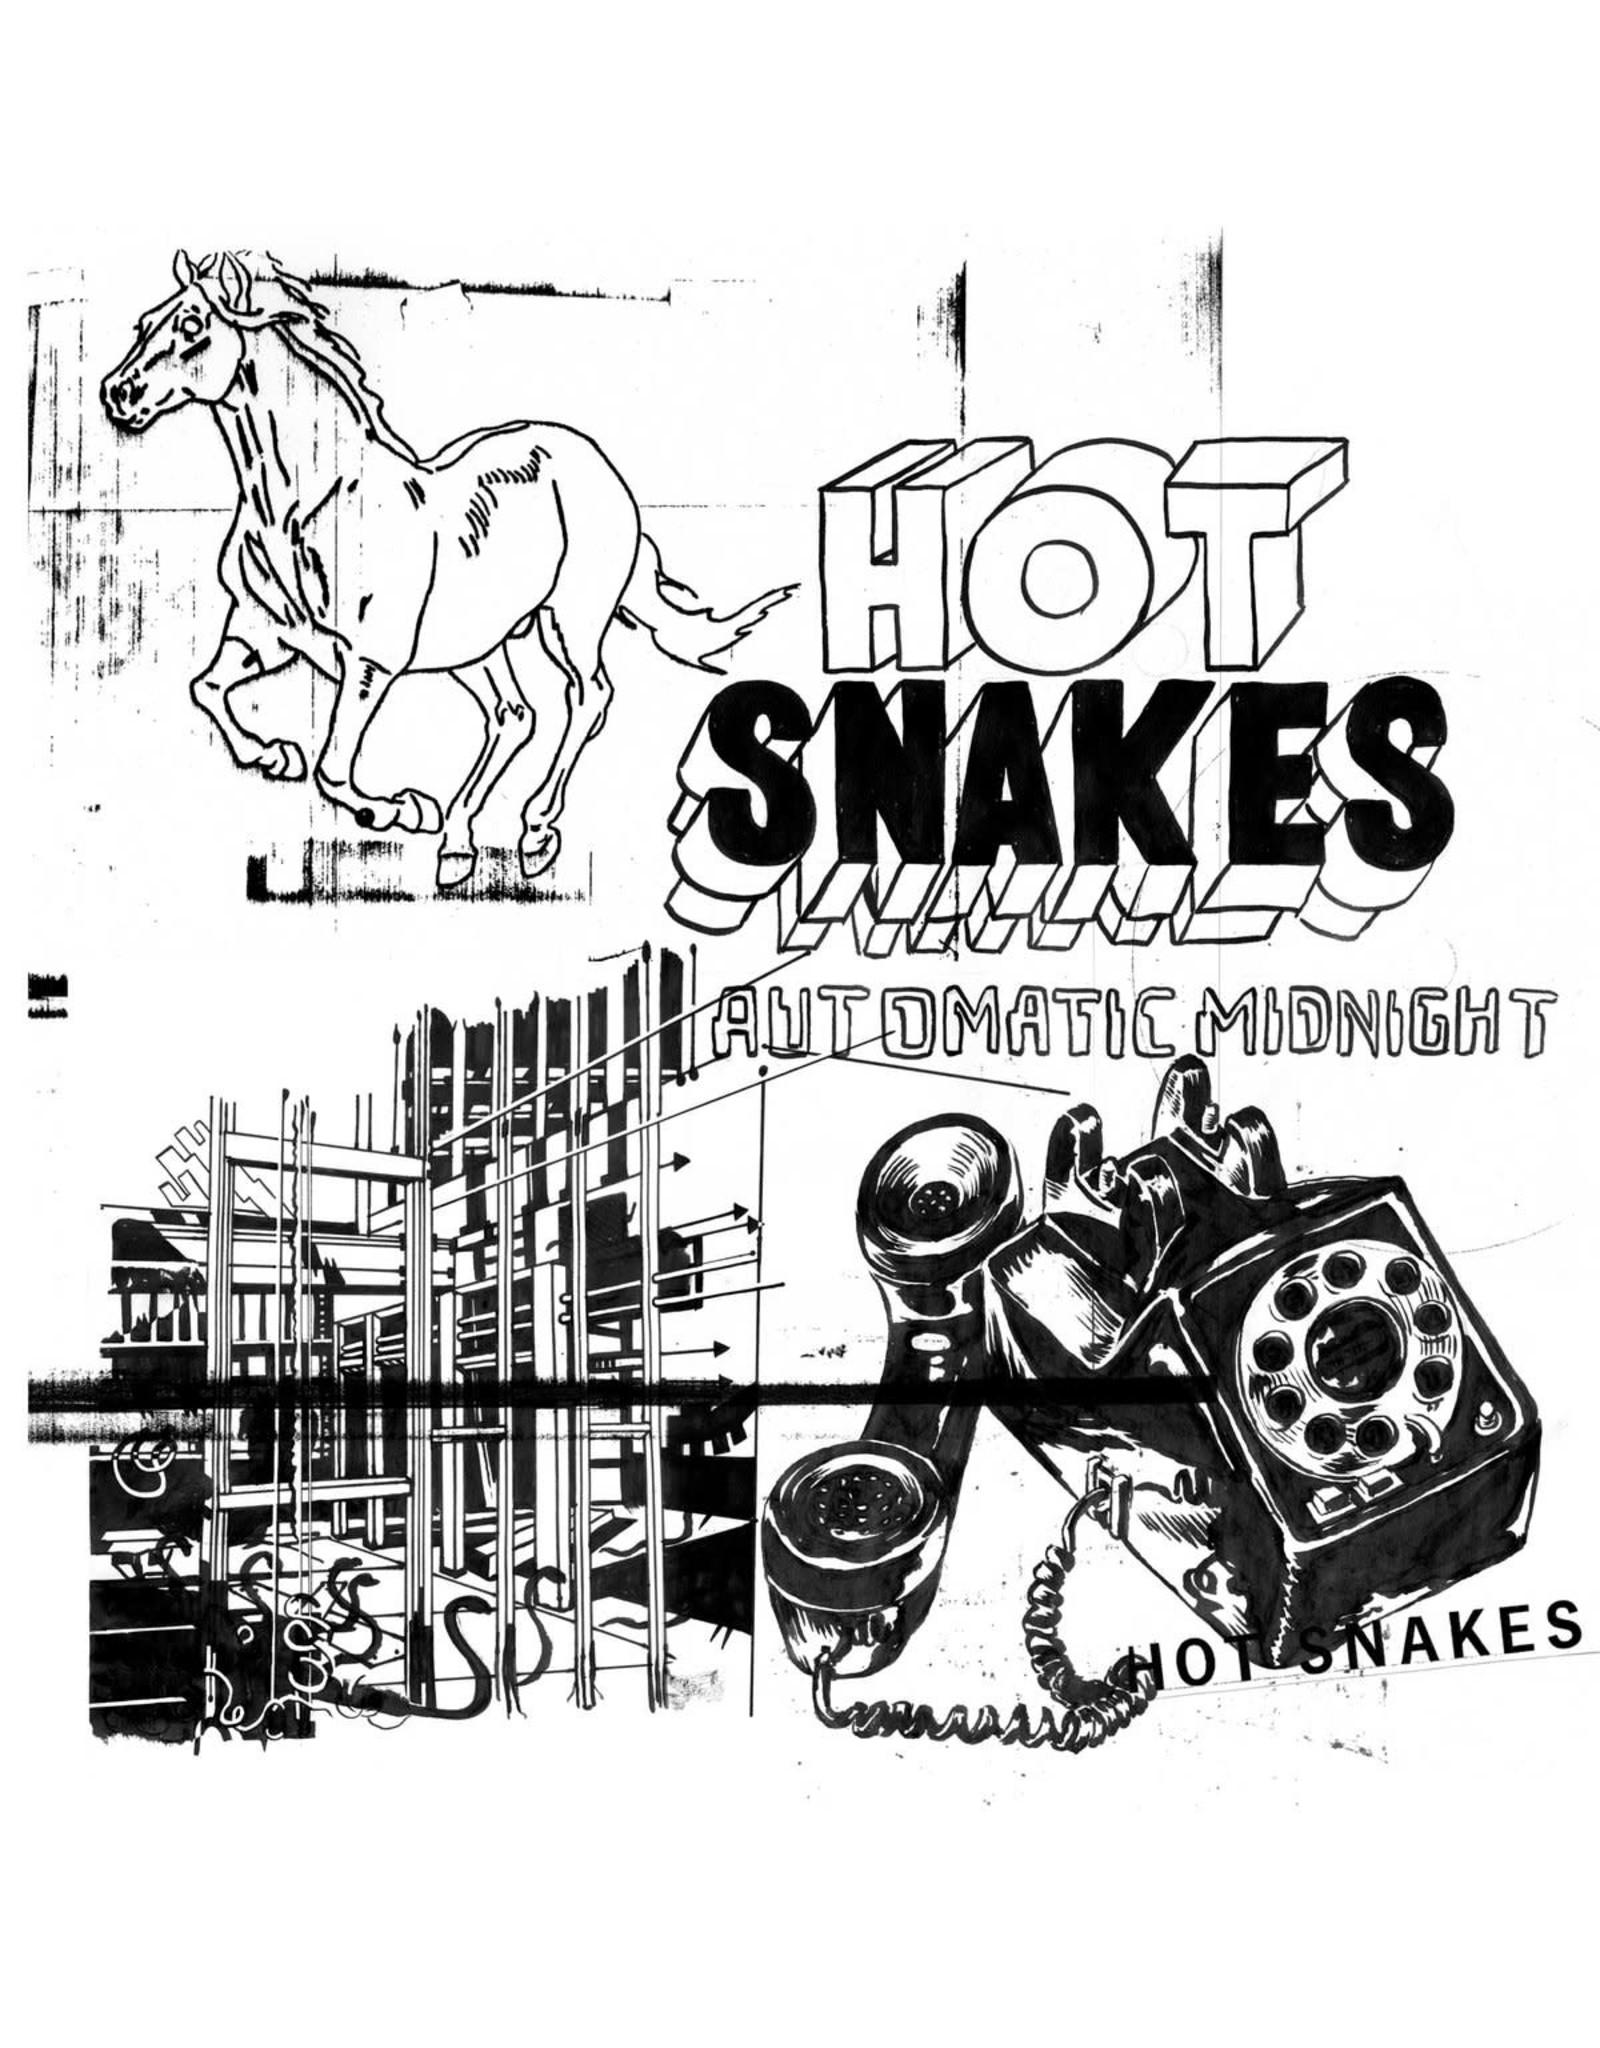 New Vinyl Hot Snakes - Automatic Midnight LP